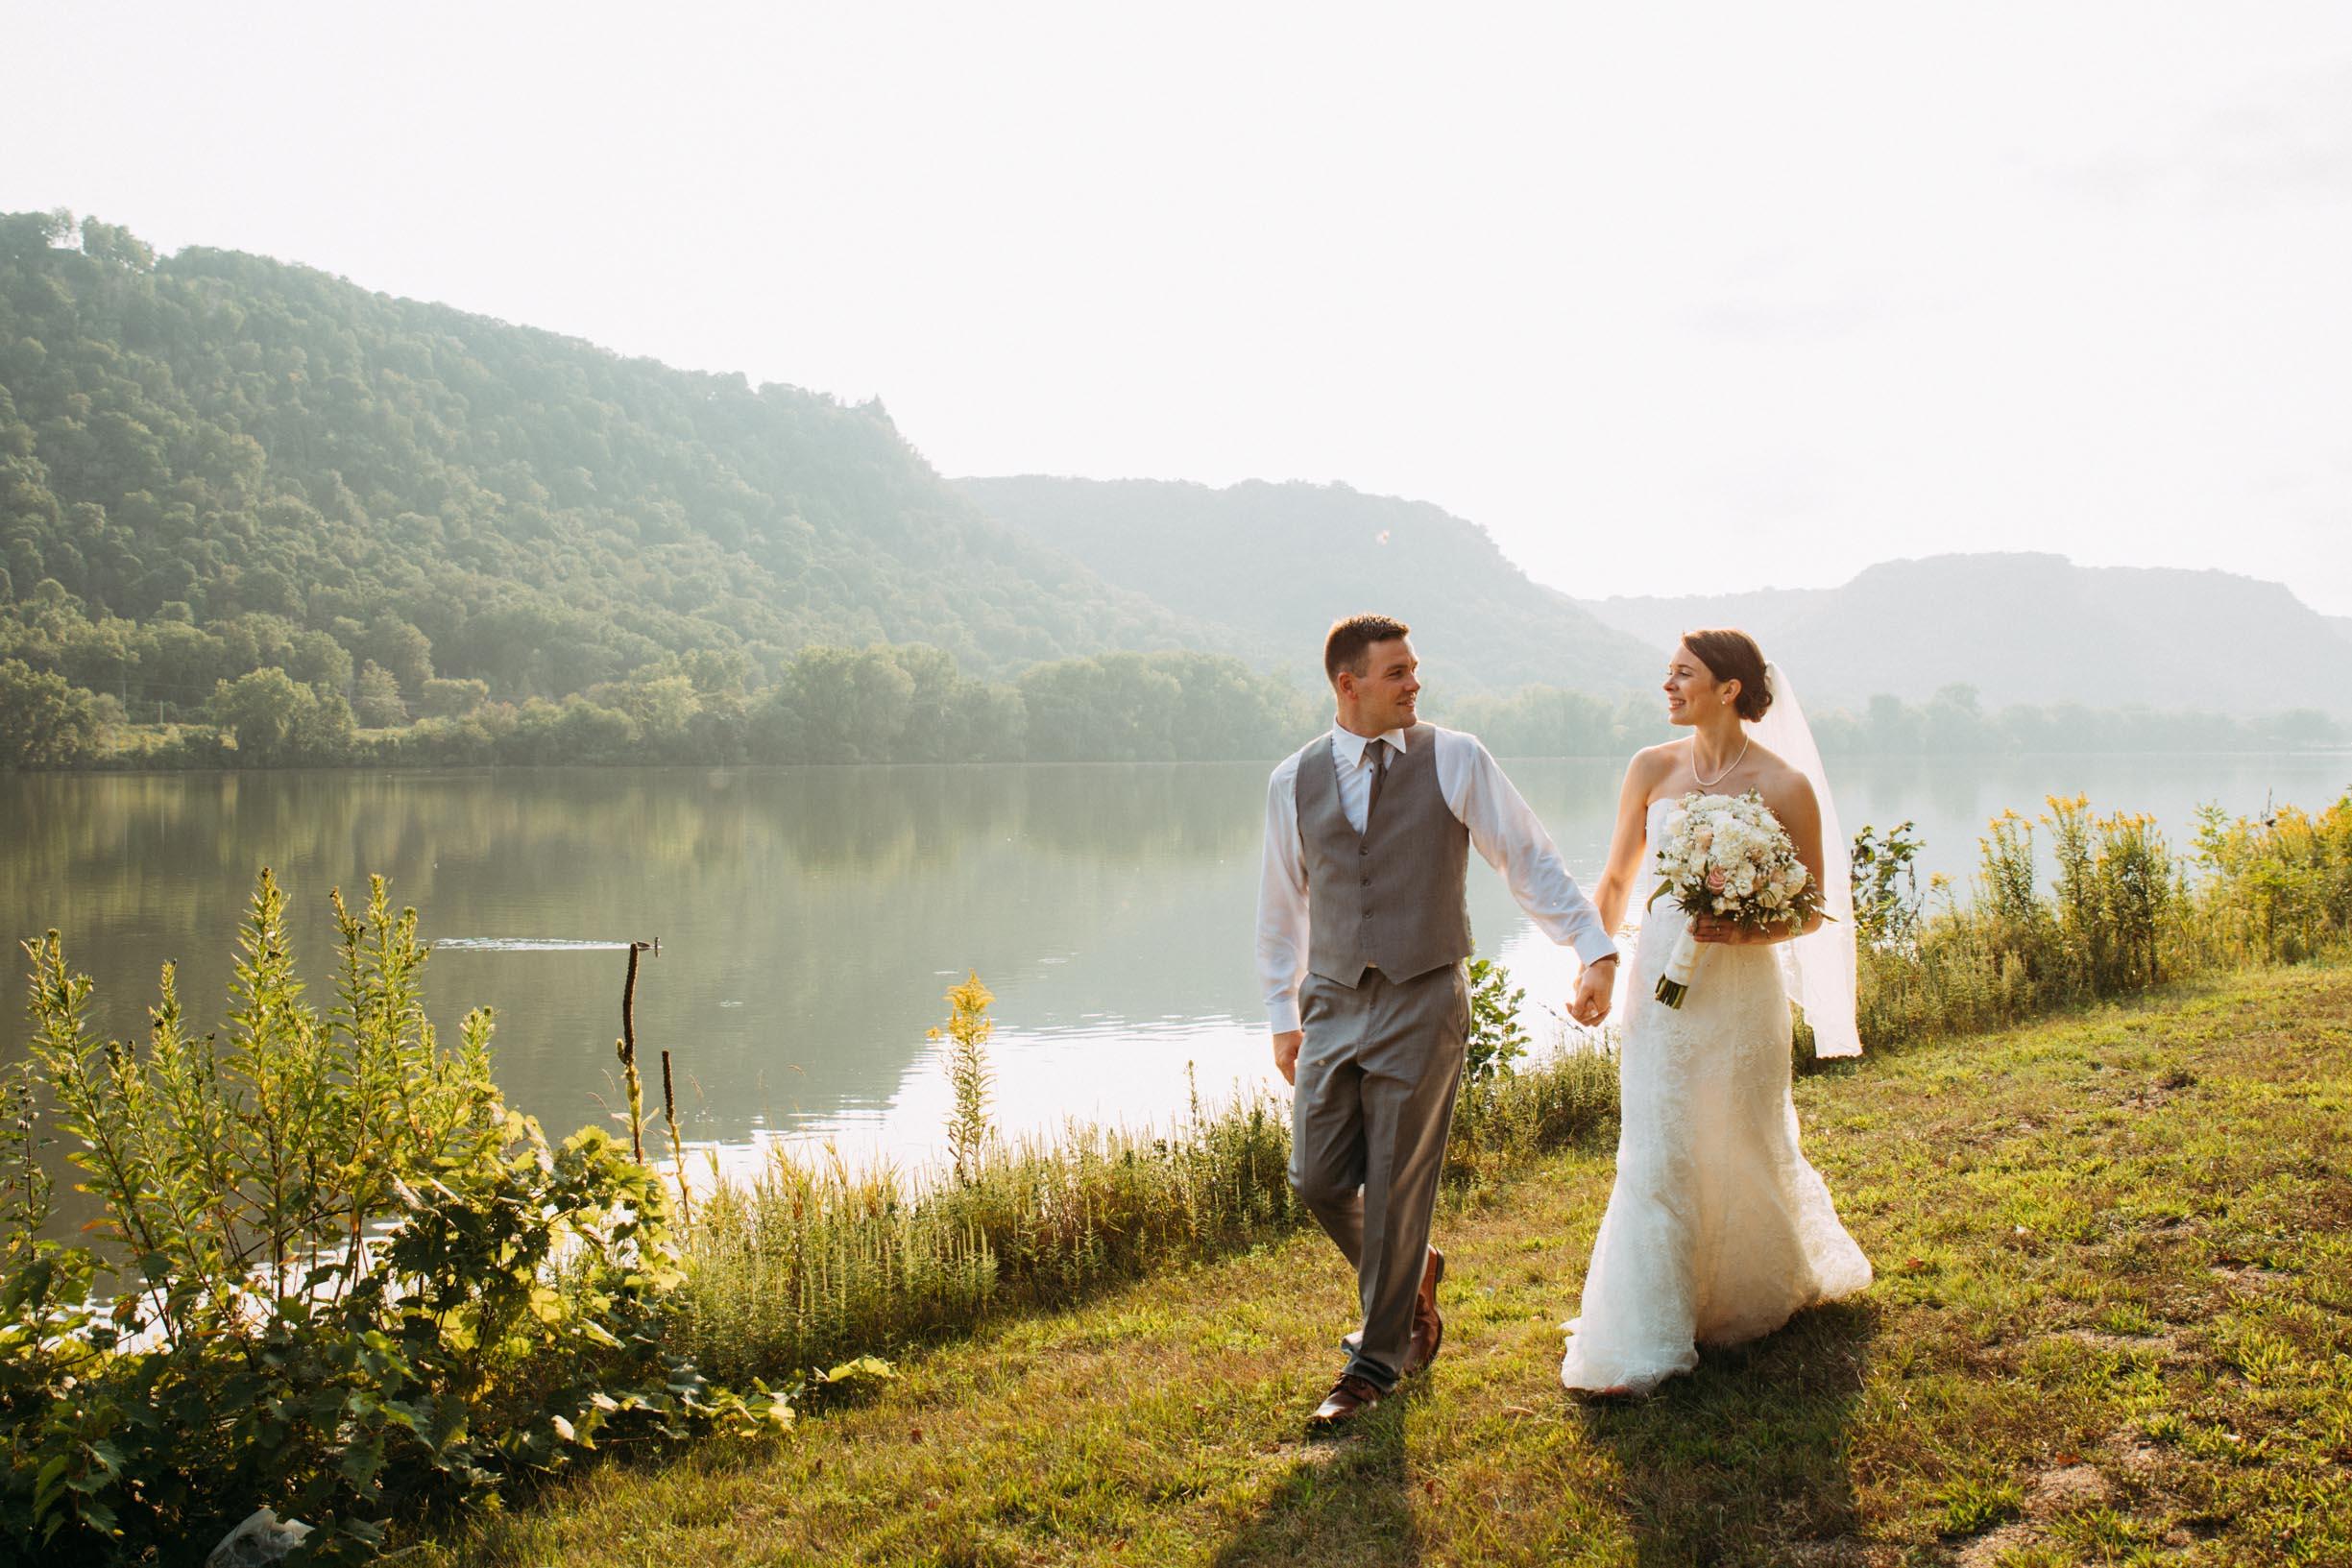 30-Lindsey Jake Wedding Portraits Winona Bride Groom.jpg